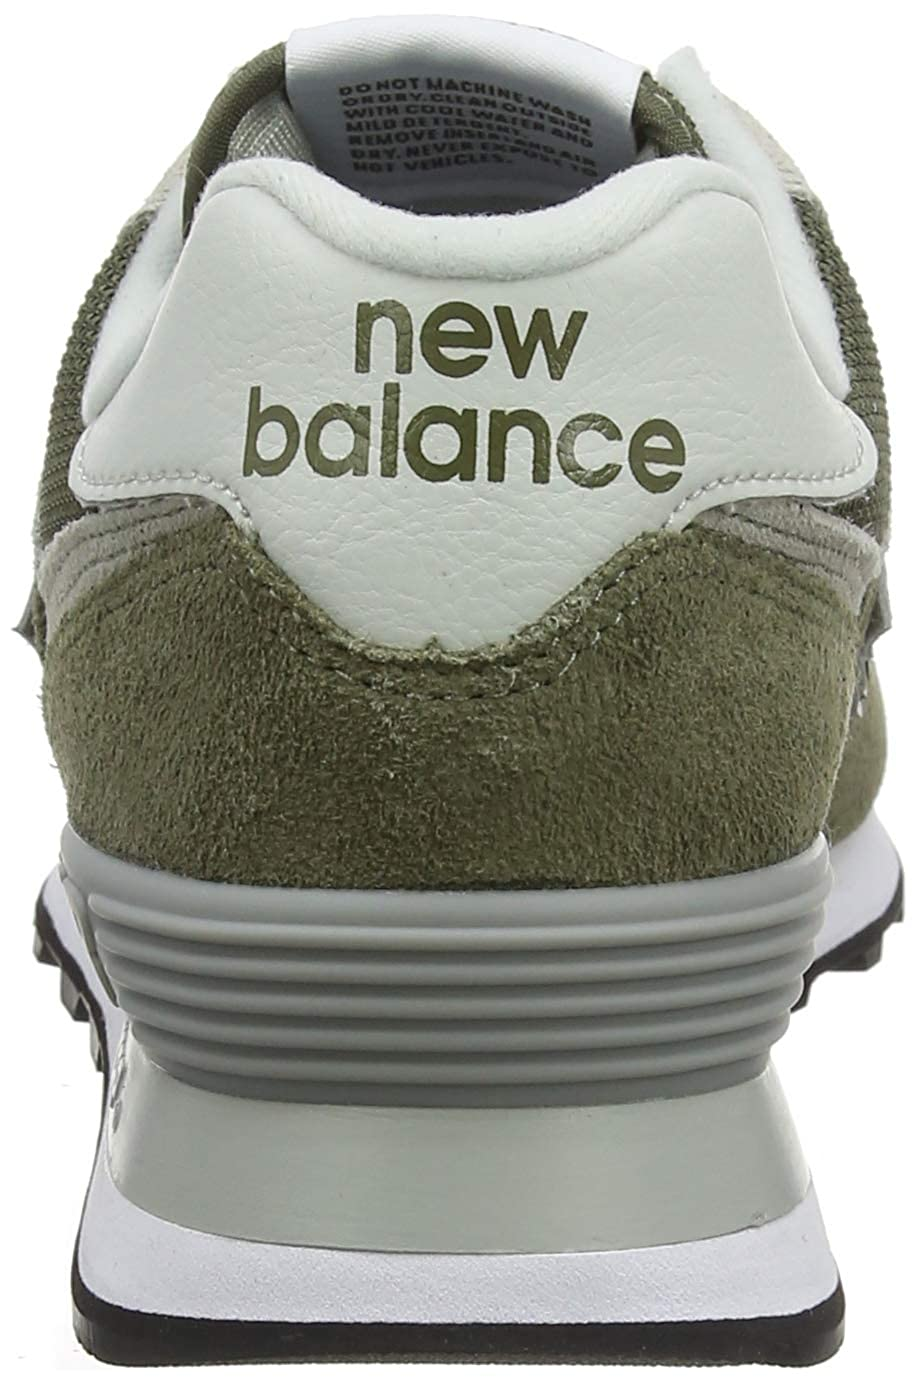 link scarpe new balance 574v2